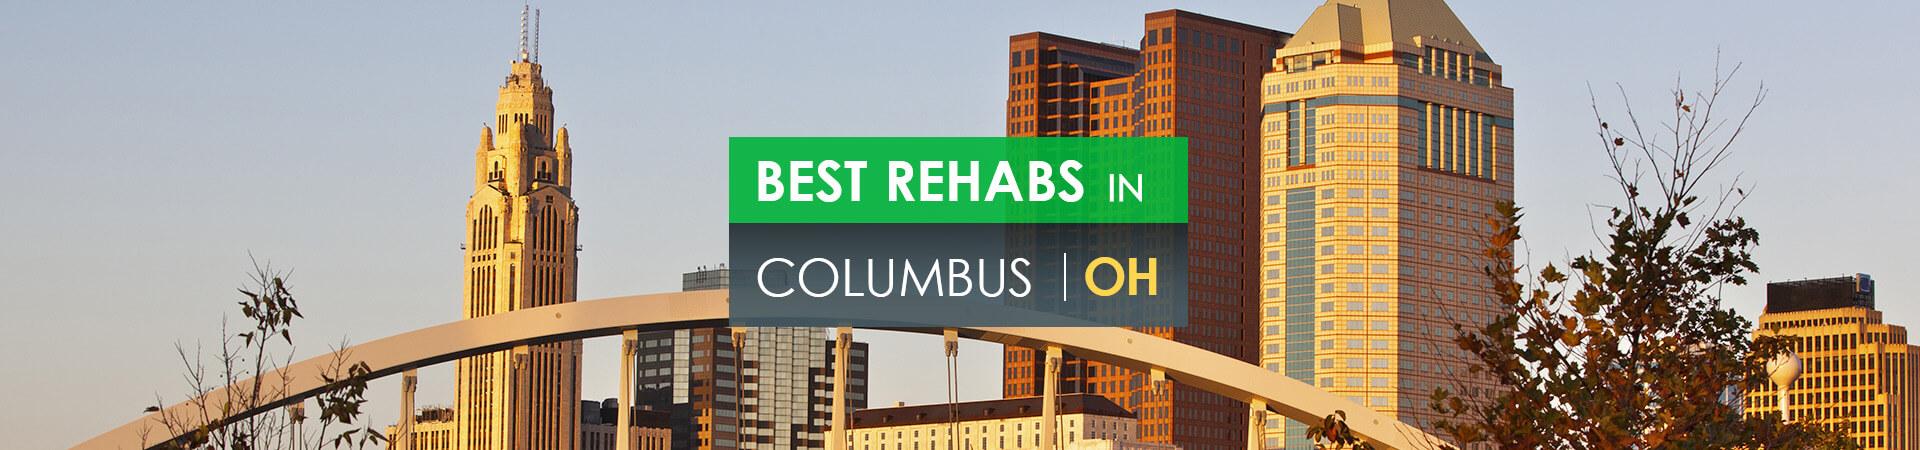 Best rehabs in Columbus, OH